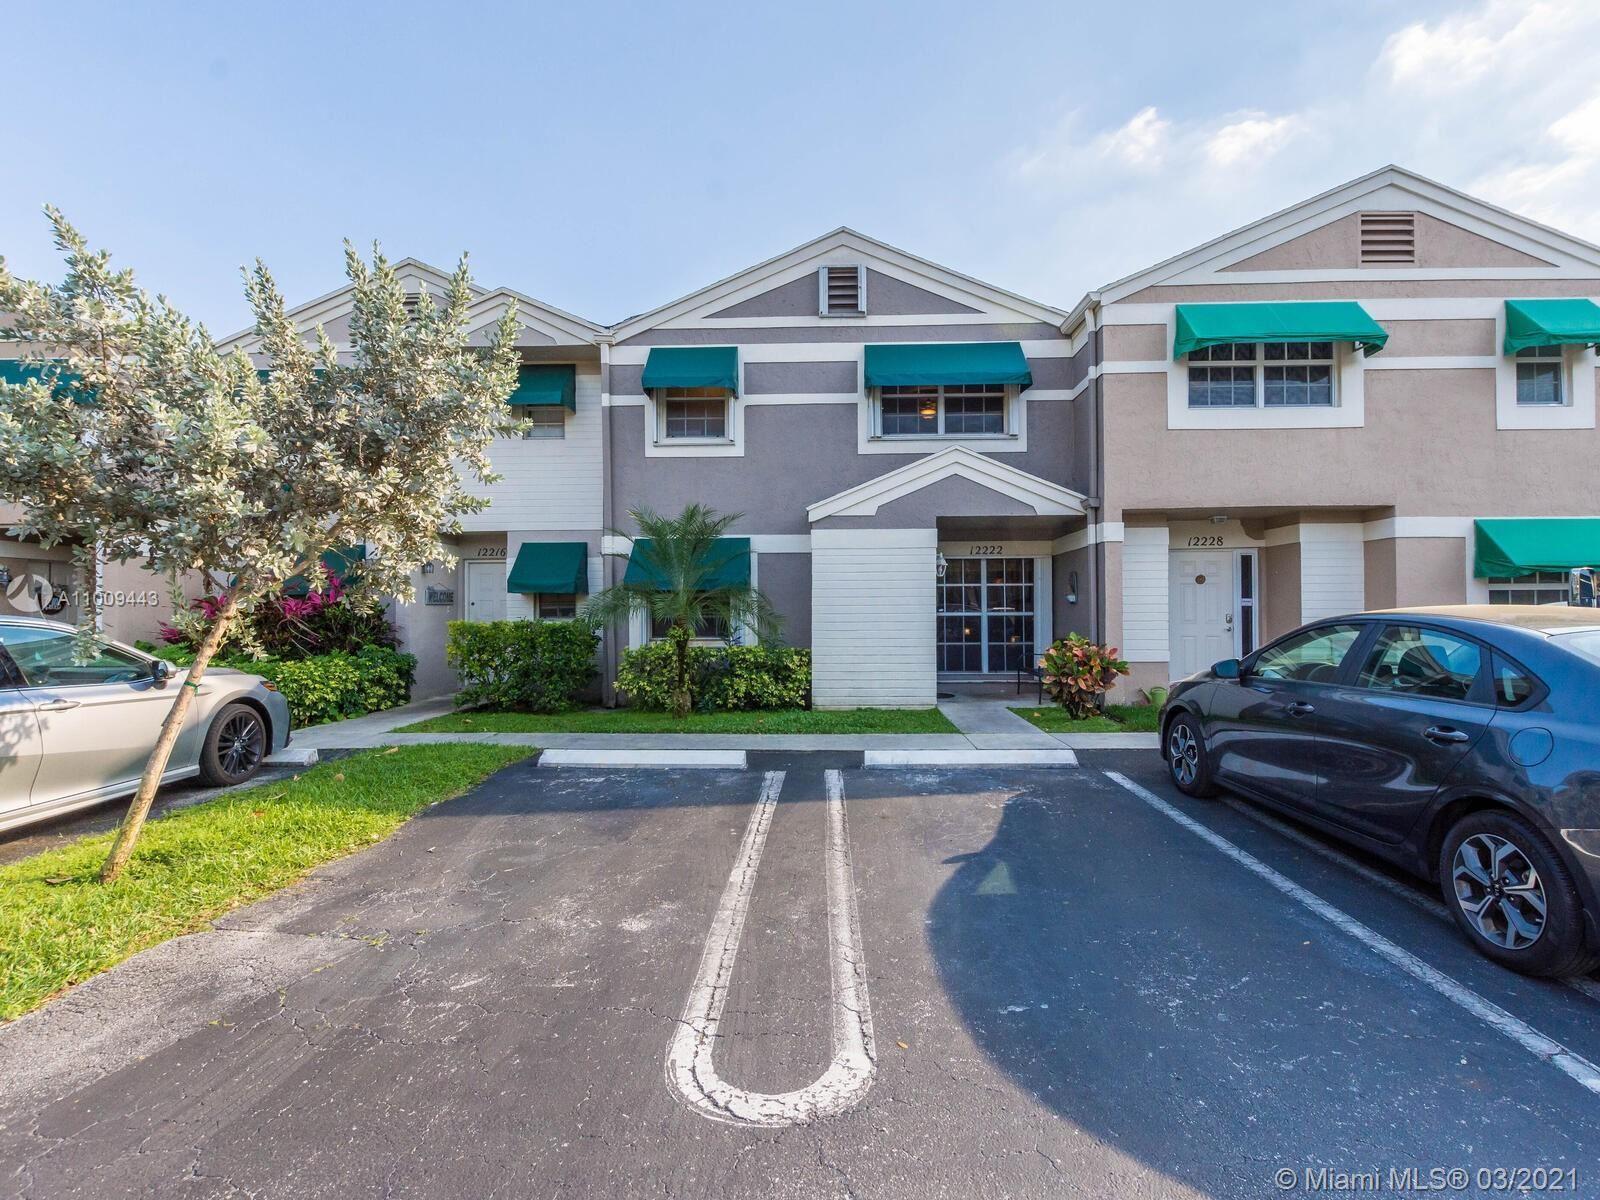 Photo of 12222 SW 51st Pl #0, Cooper City, FL 33330 (MLS # A11009443)